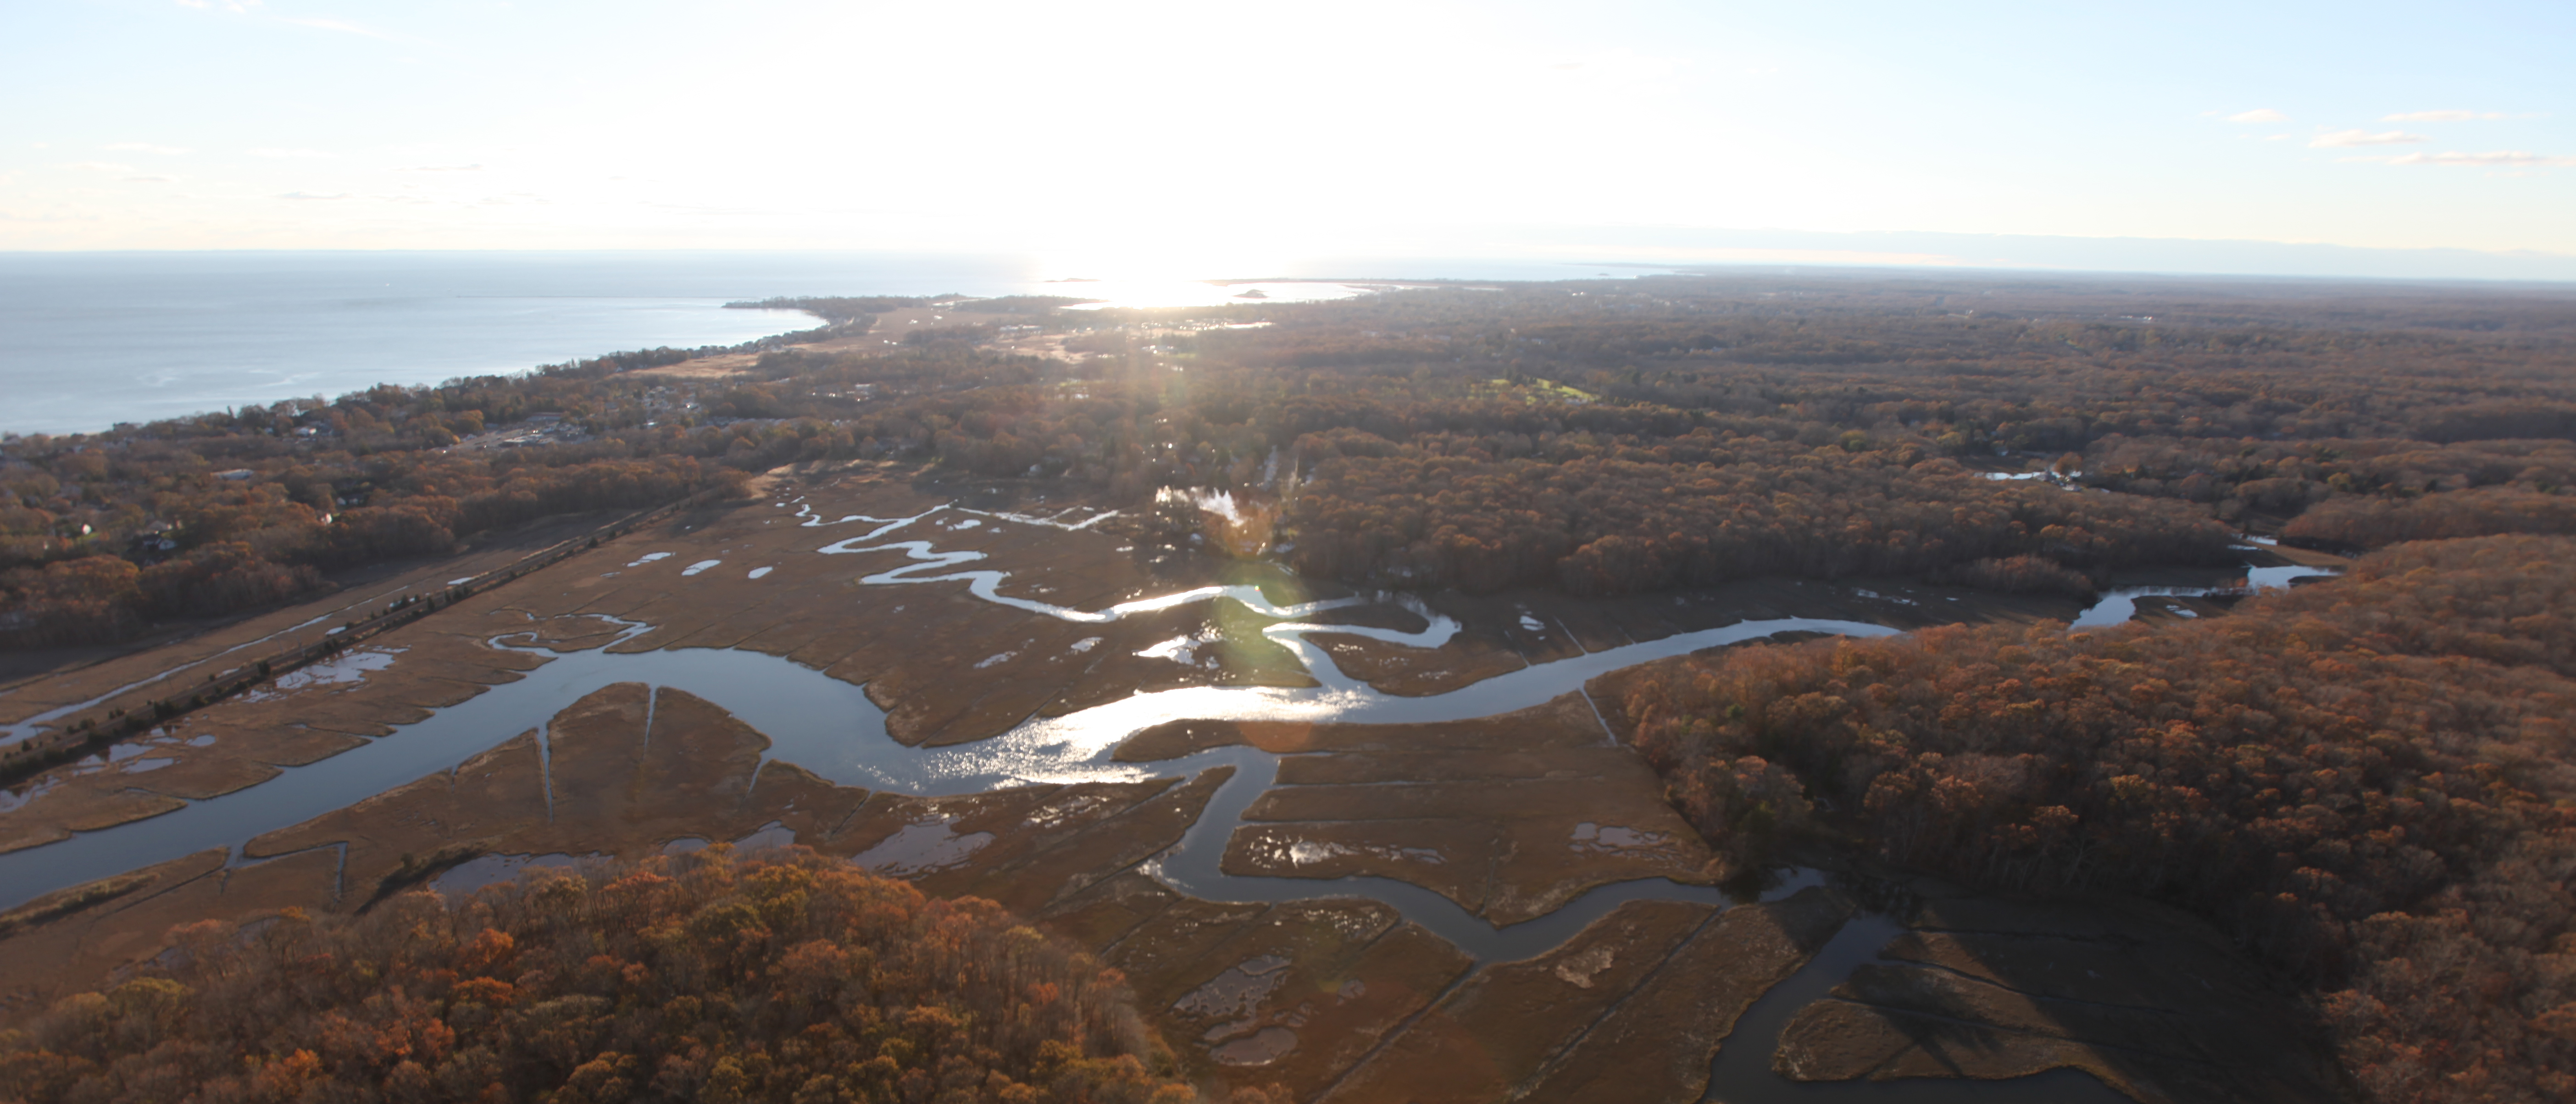 Aerial view of Stewart B. McKinney National Wildlife Refuge where NOAA will lead restoration of marsh habitat.